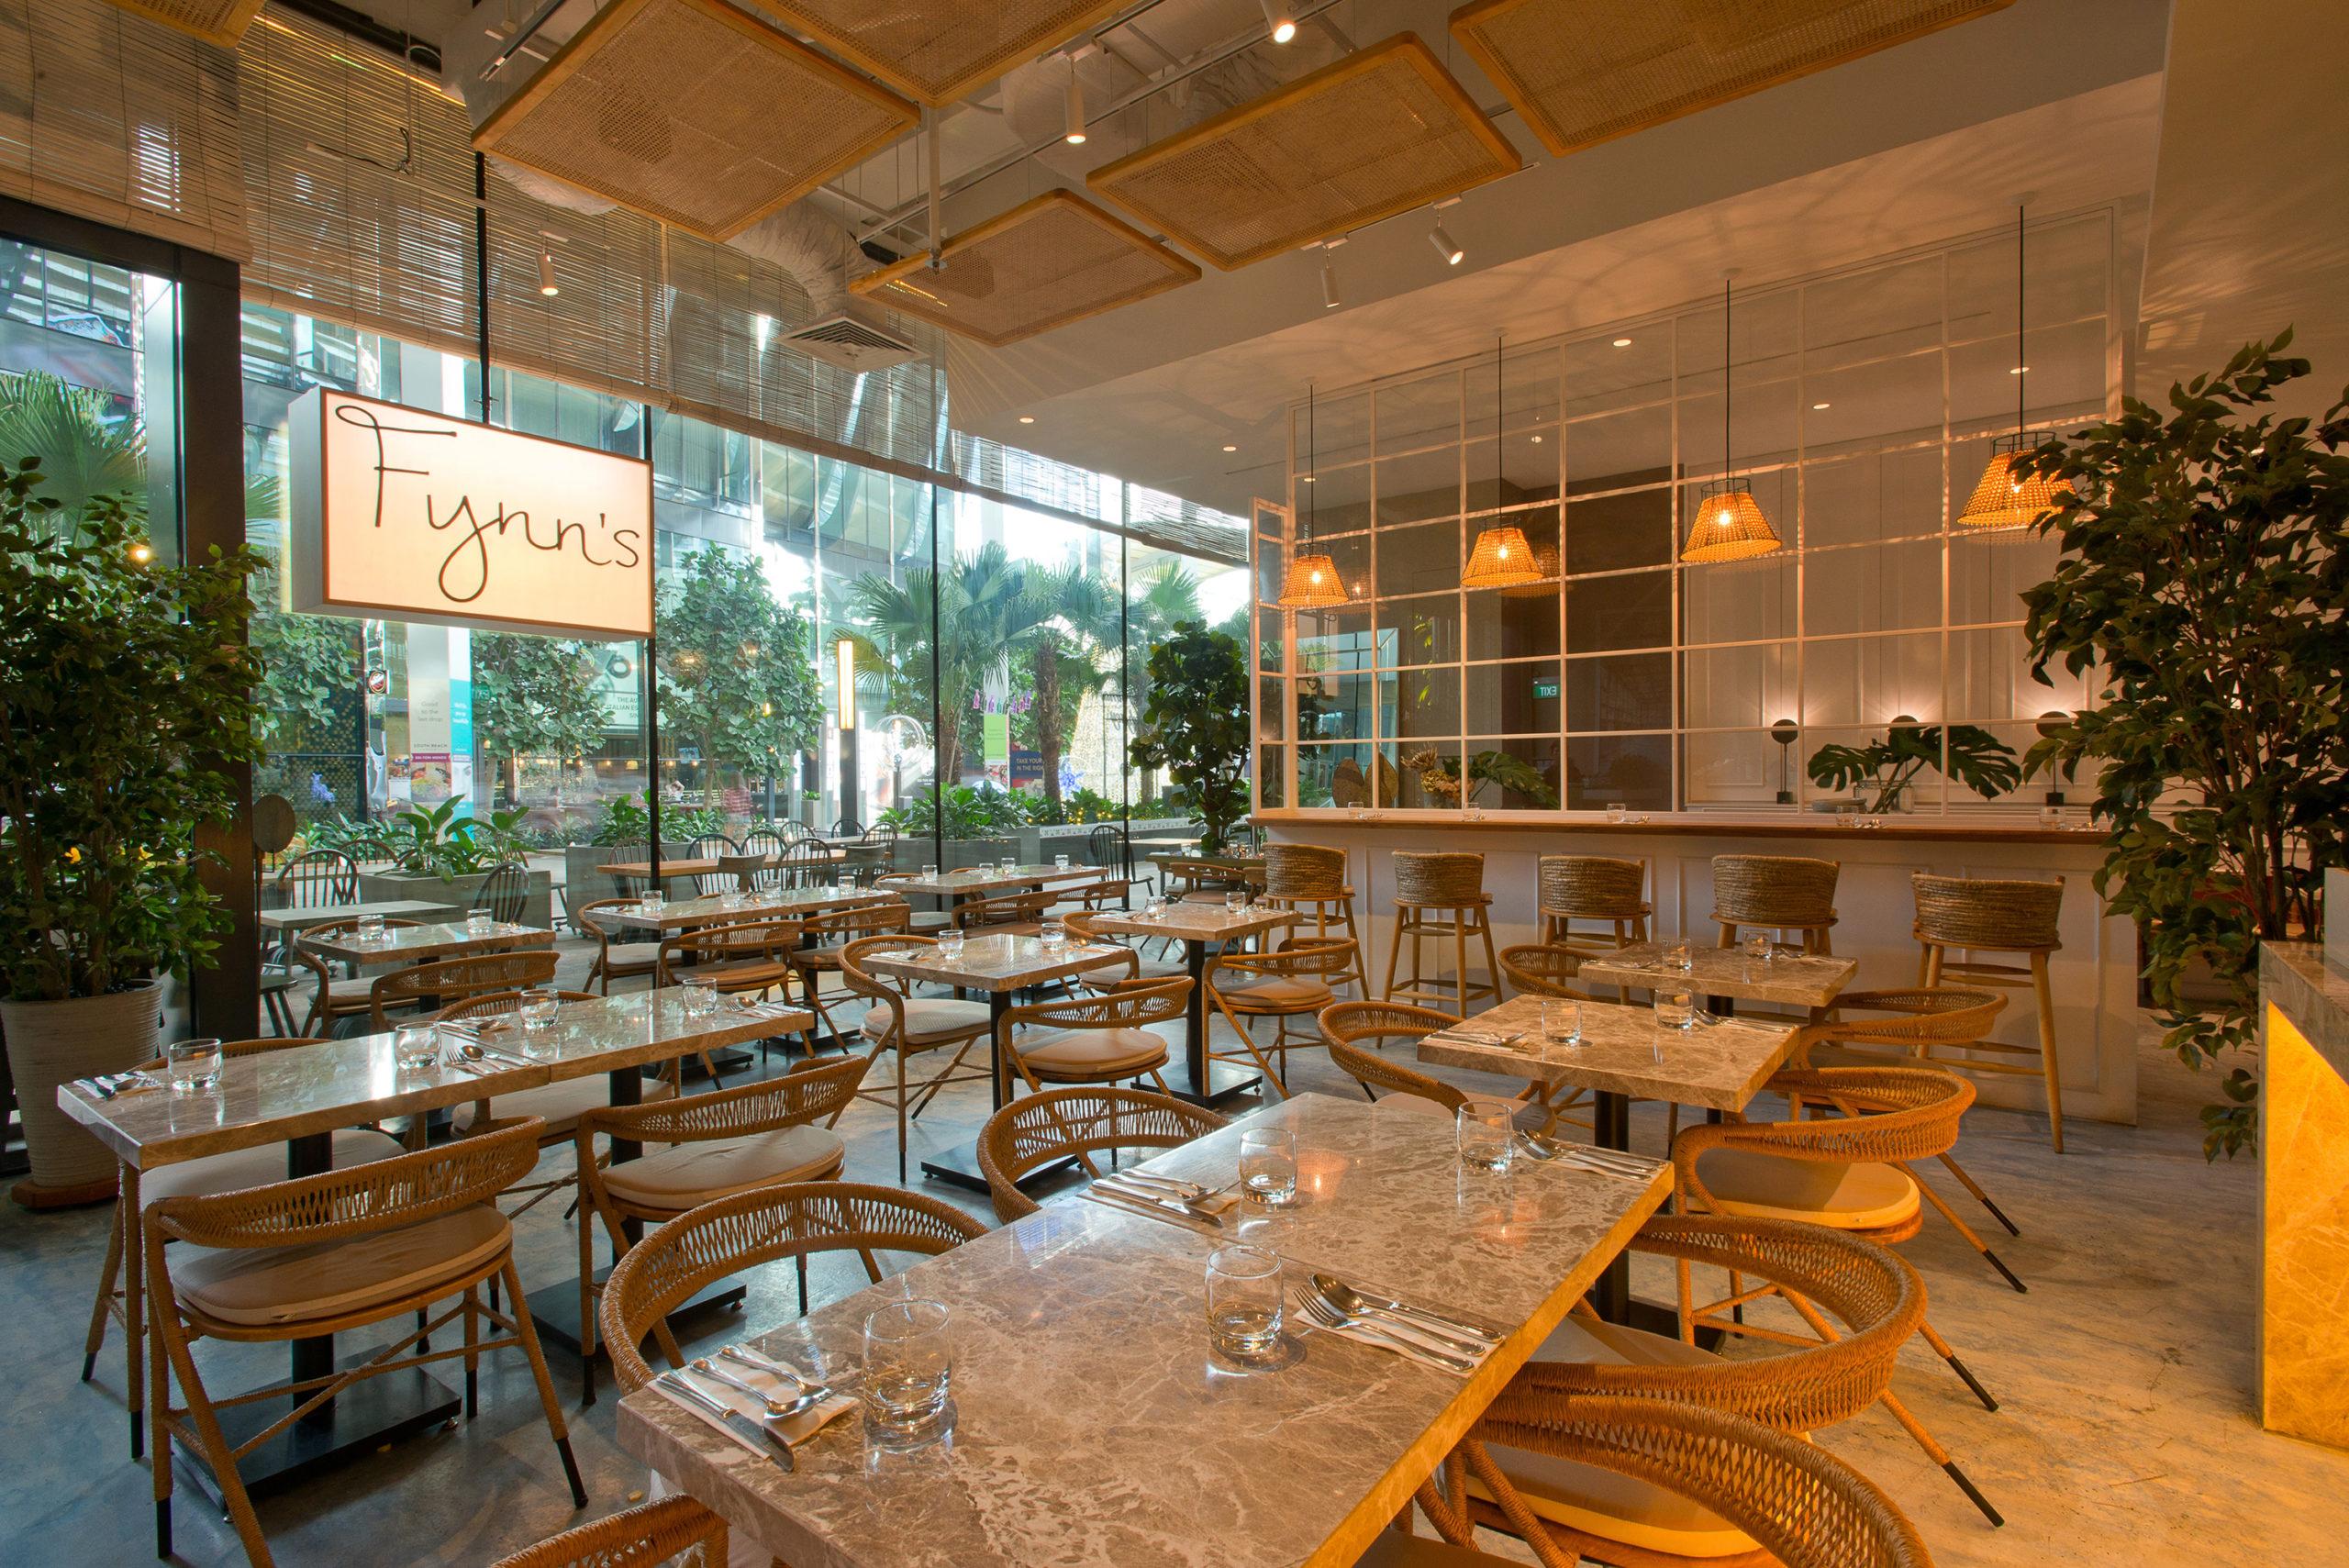 Fynn's Restaurant